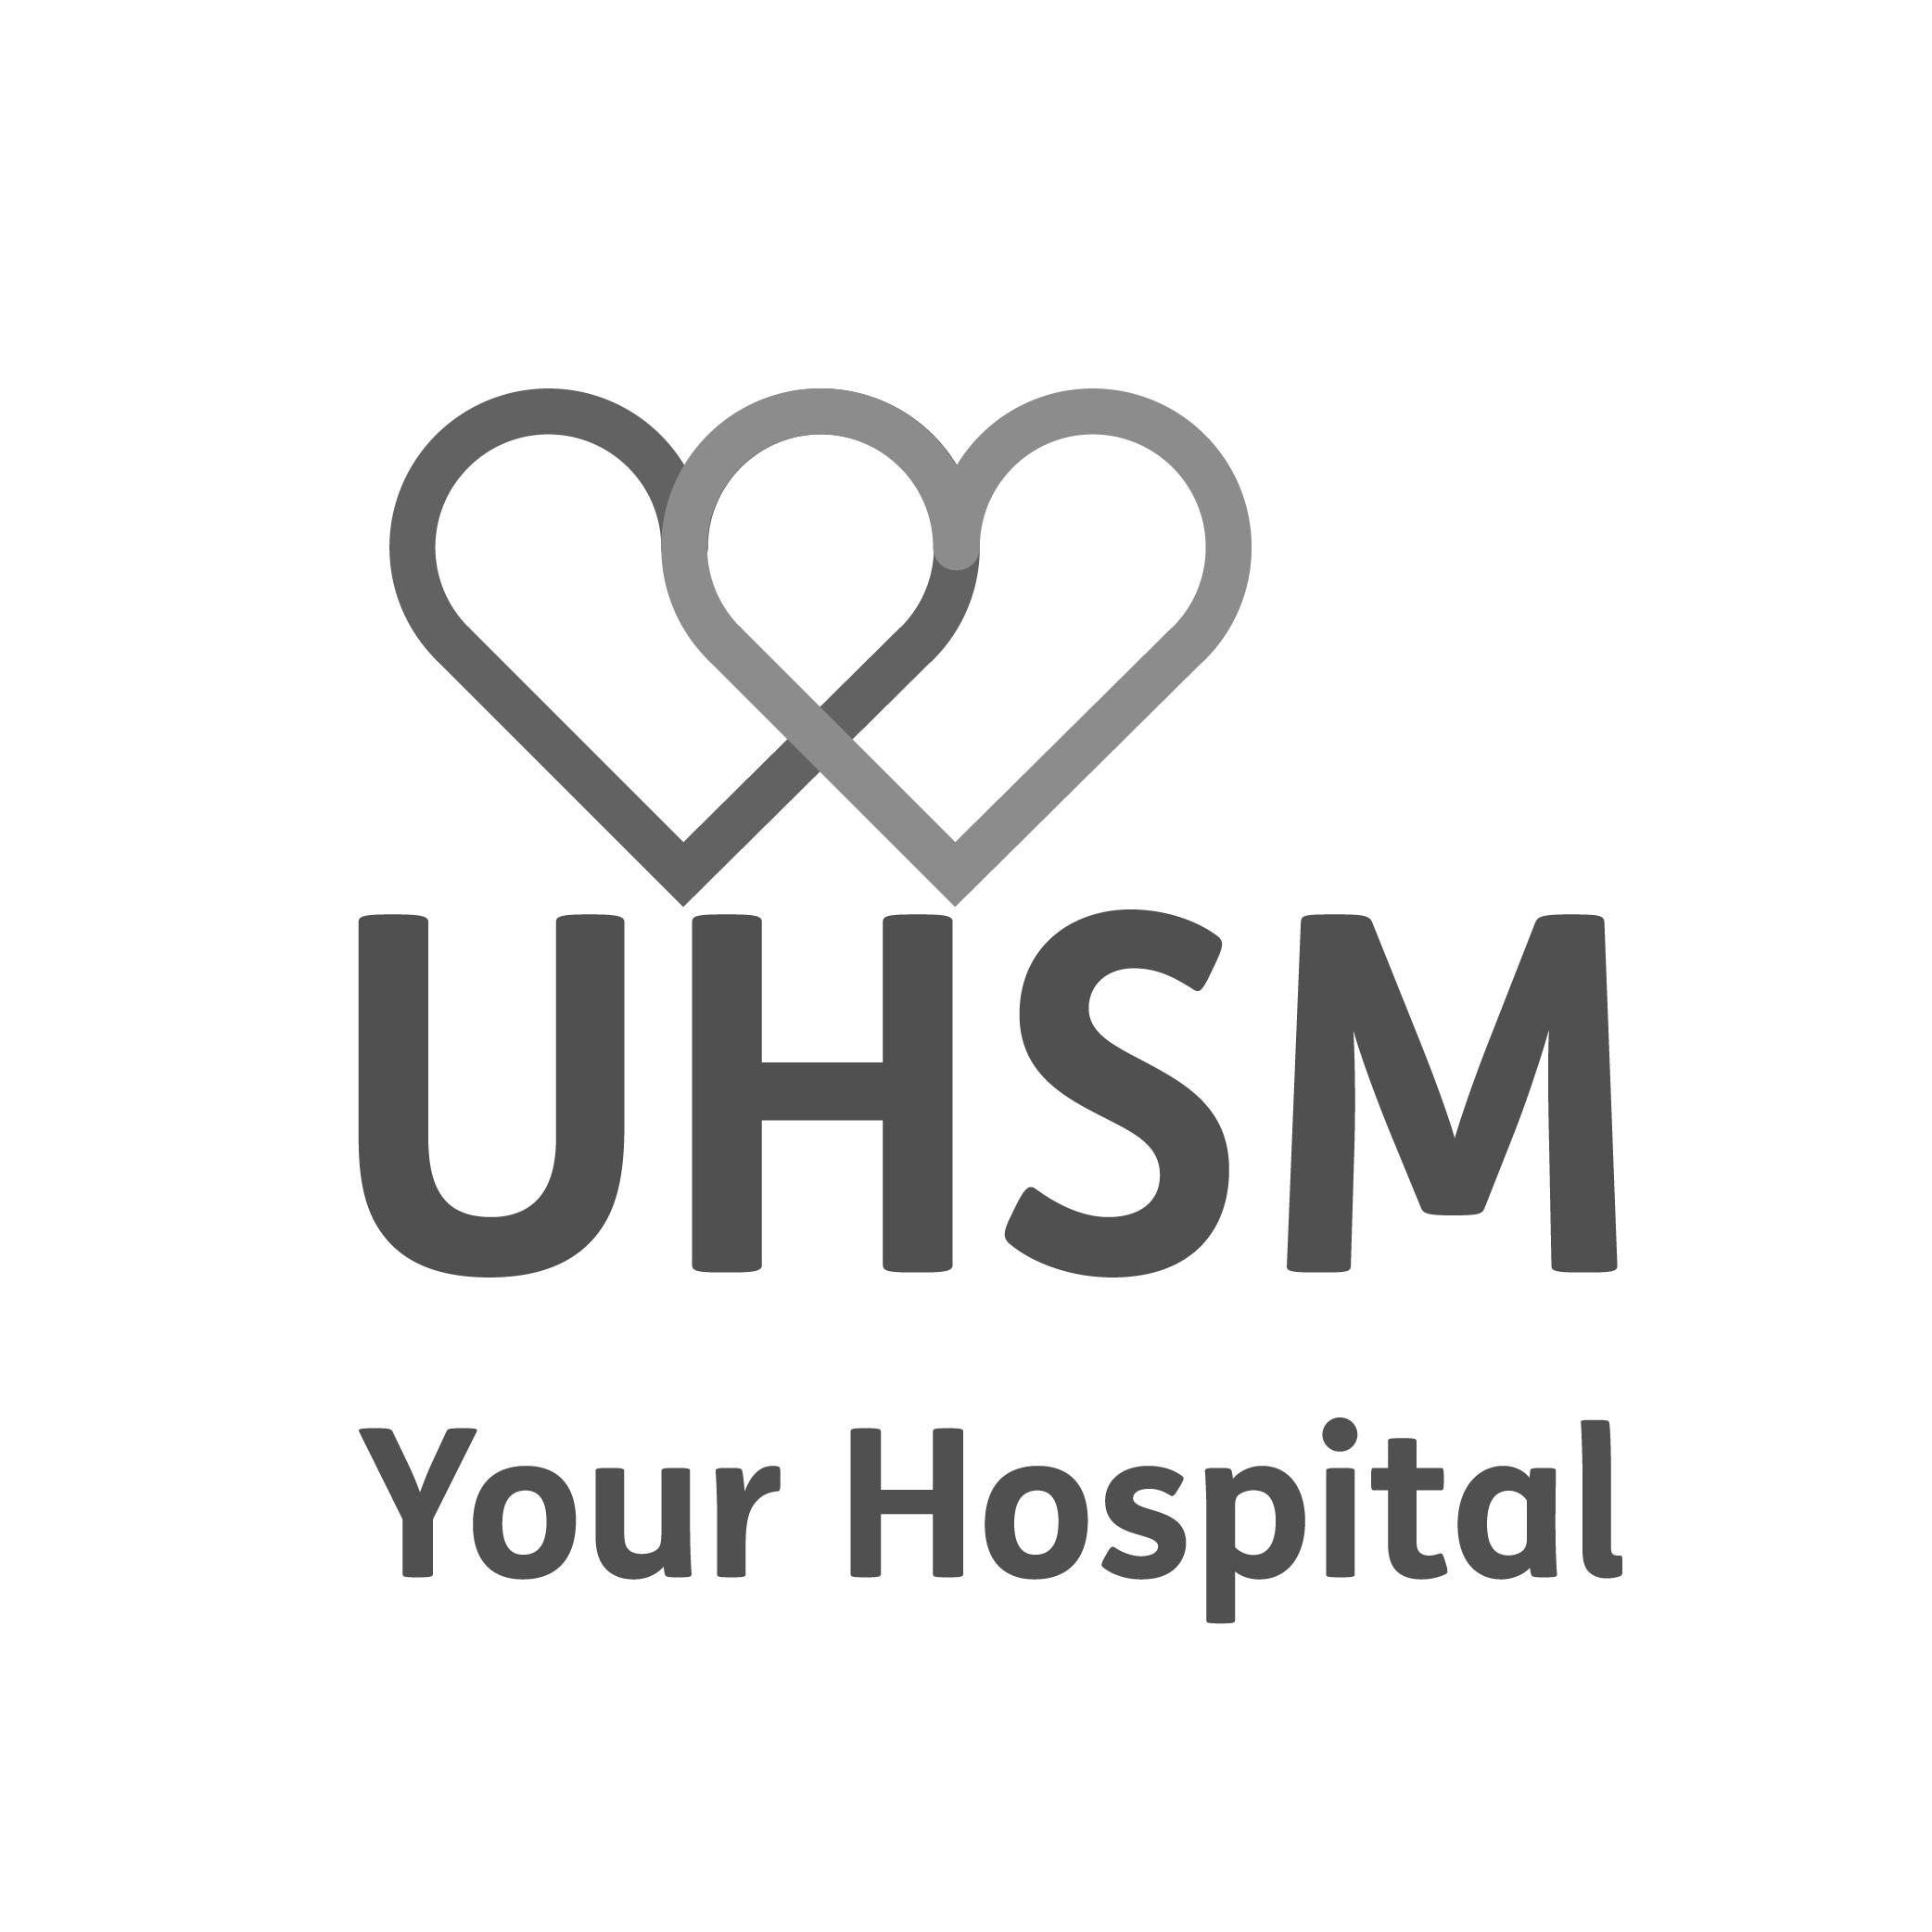 UHSM-01.jpg